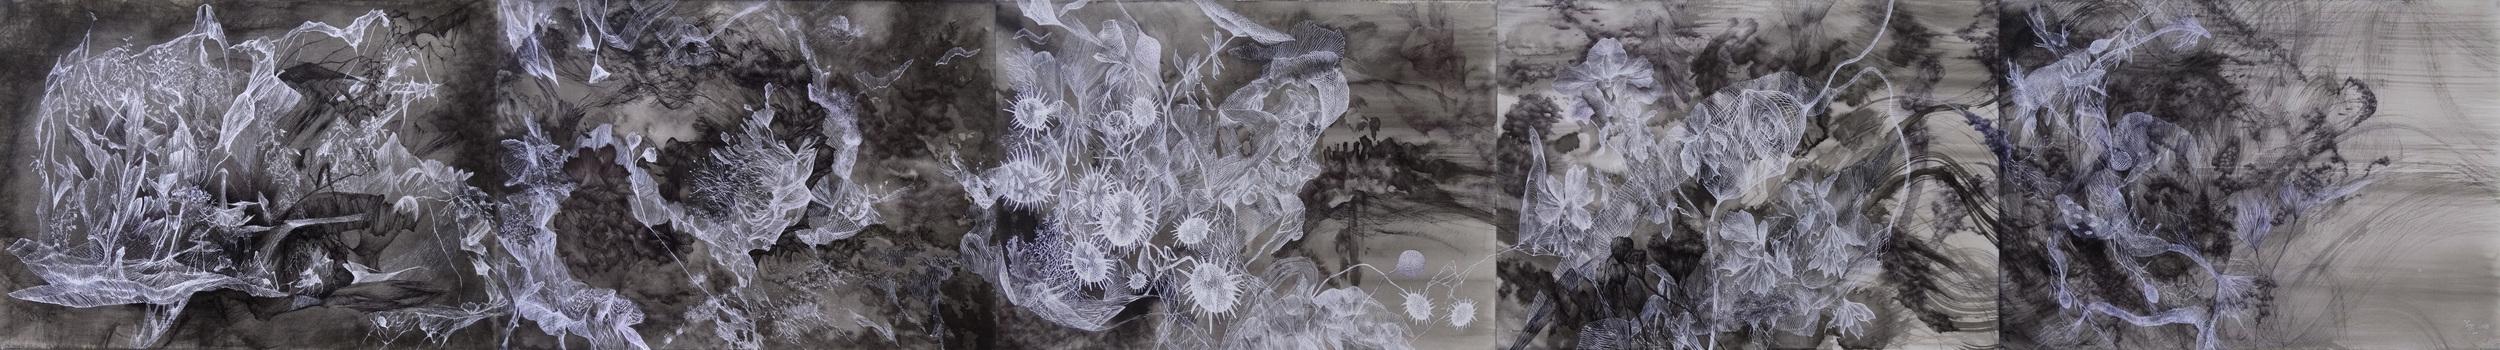 S.K.U.L.L. (Semi-schematic Kaleidoscopic Unreal Lilliputian Landscape)